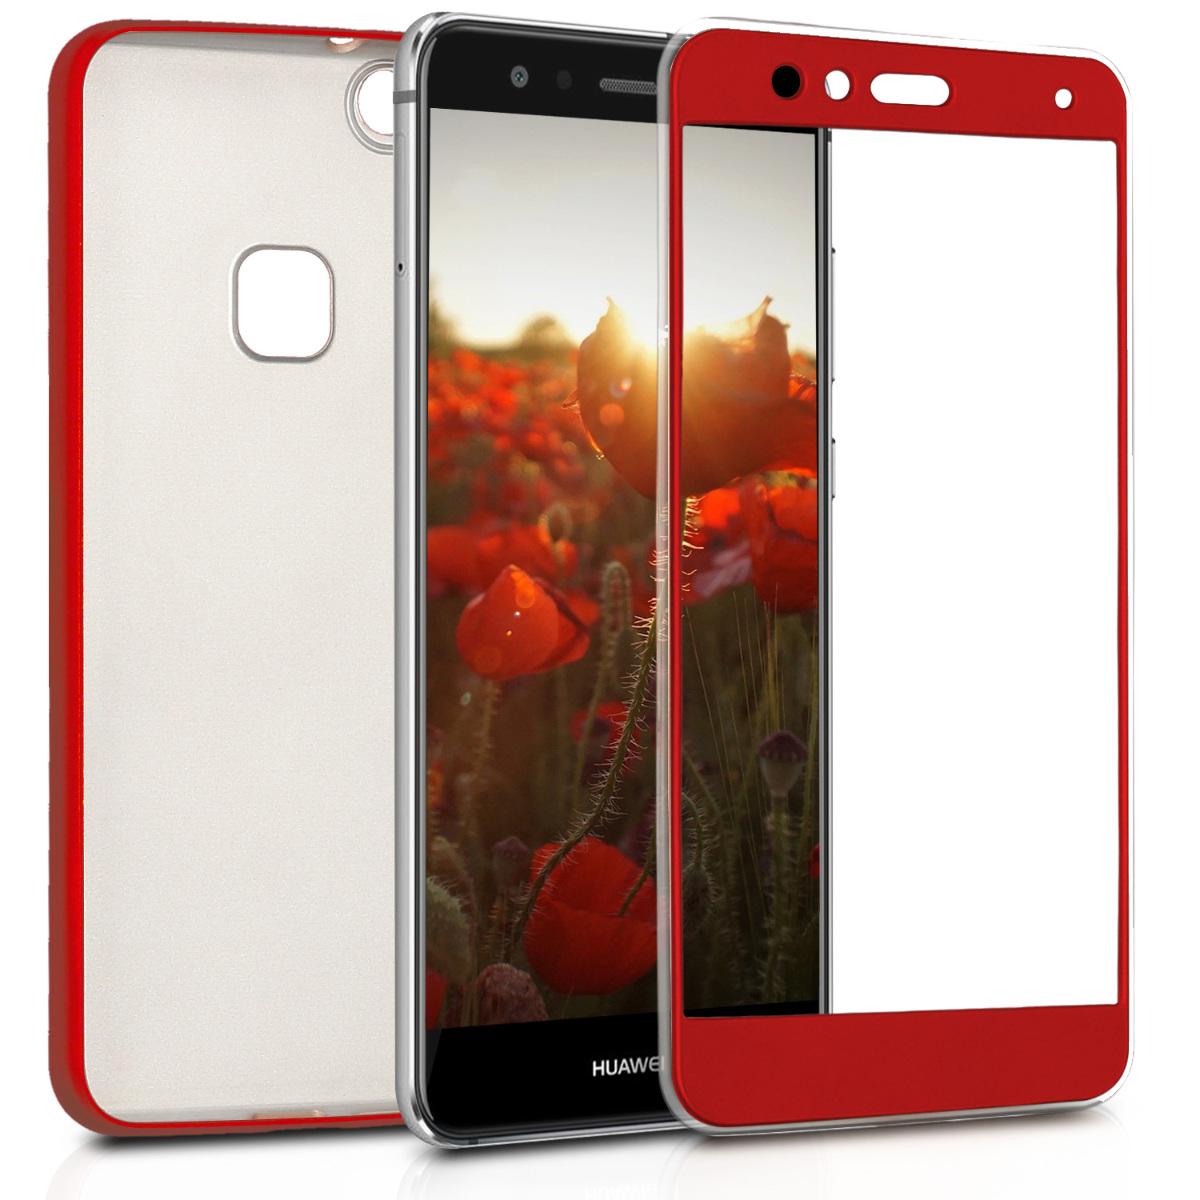 KW Θήκη Σιλικόνης Full Body Huawei P10 Lite - Κόκκινο μεταλλικό (41904.09)